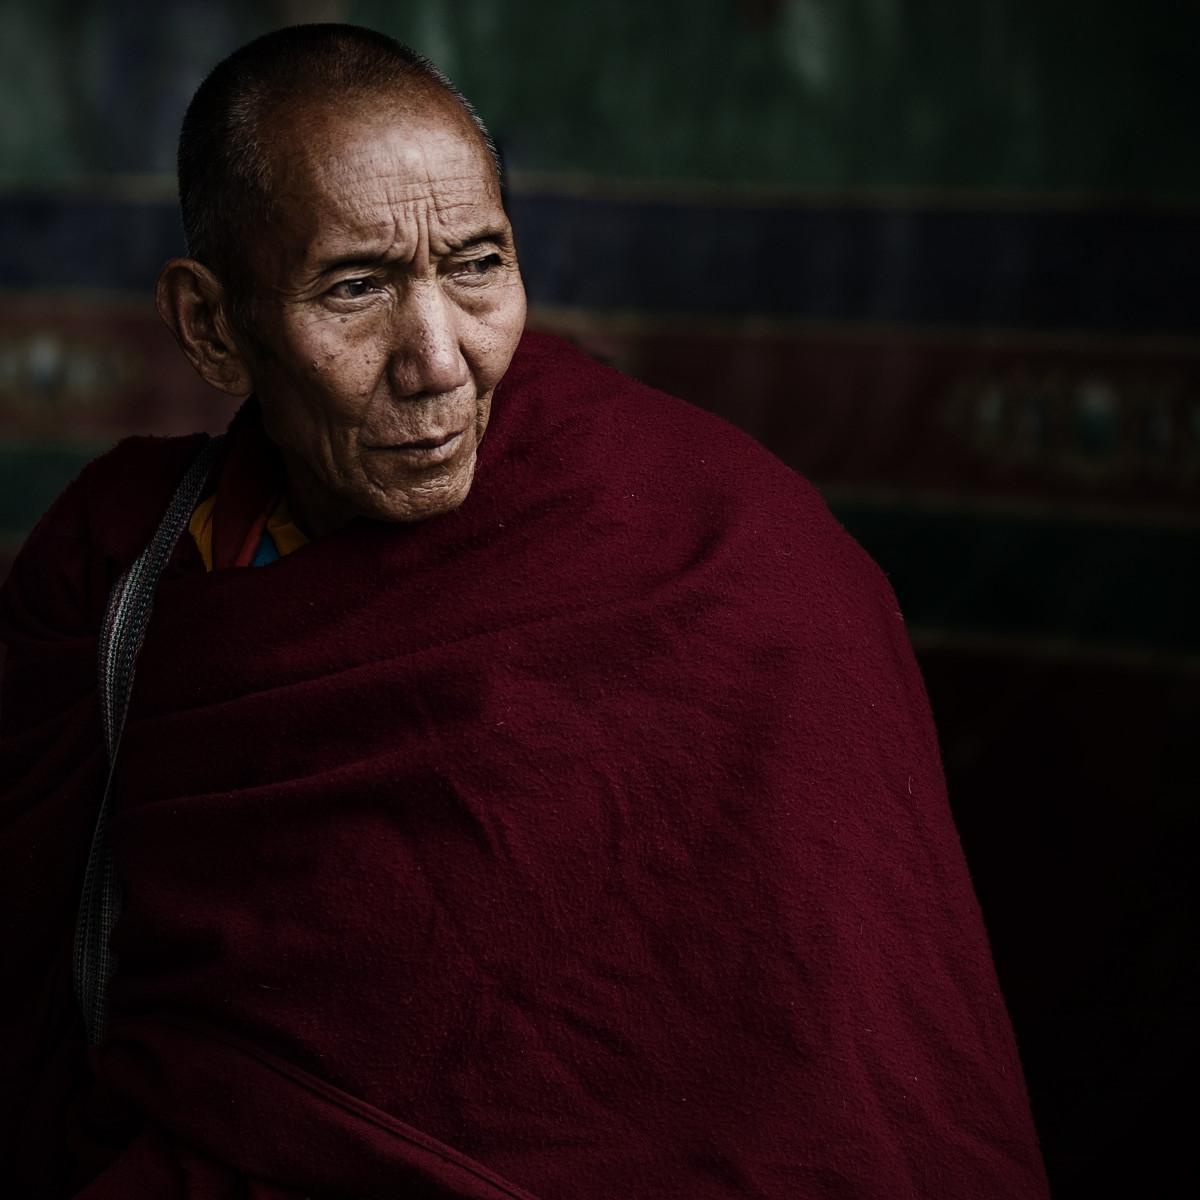 homem pessoa retrato Tibet lama China Captura de tela Vicissitudes Velho monge